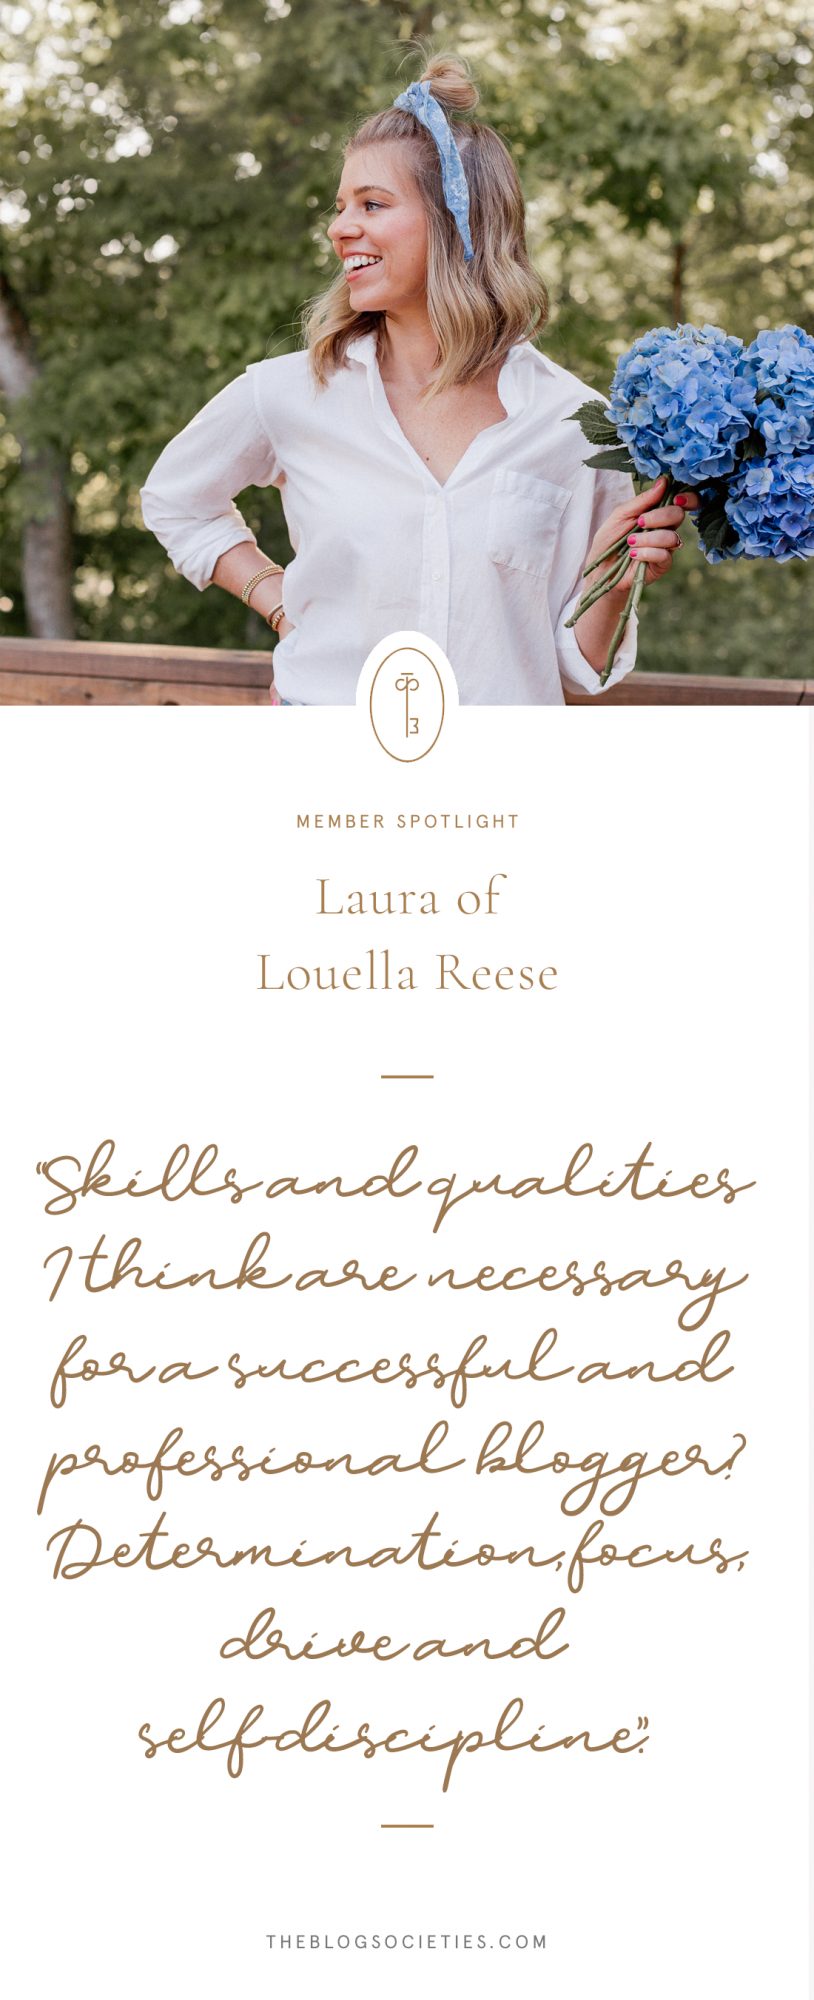 Member Spotlight: Laura of Louella Reese